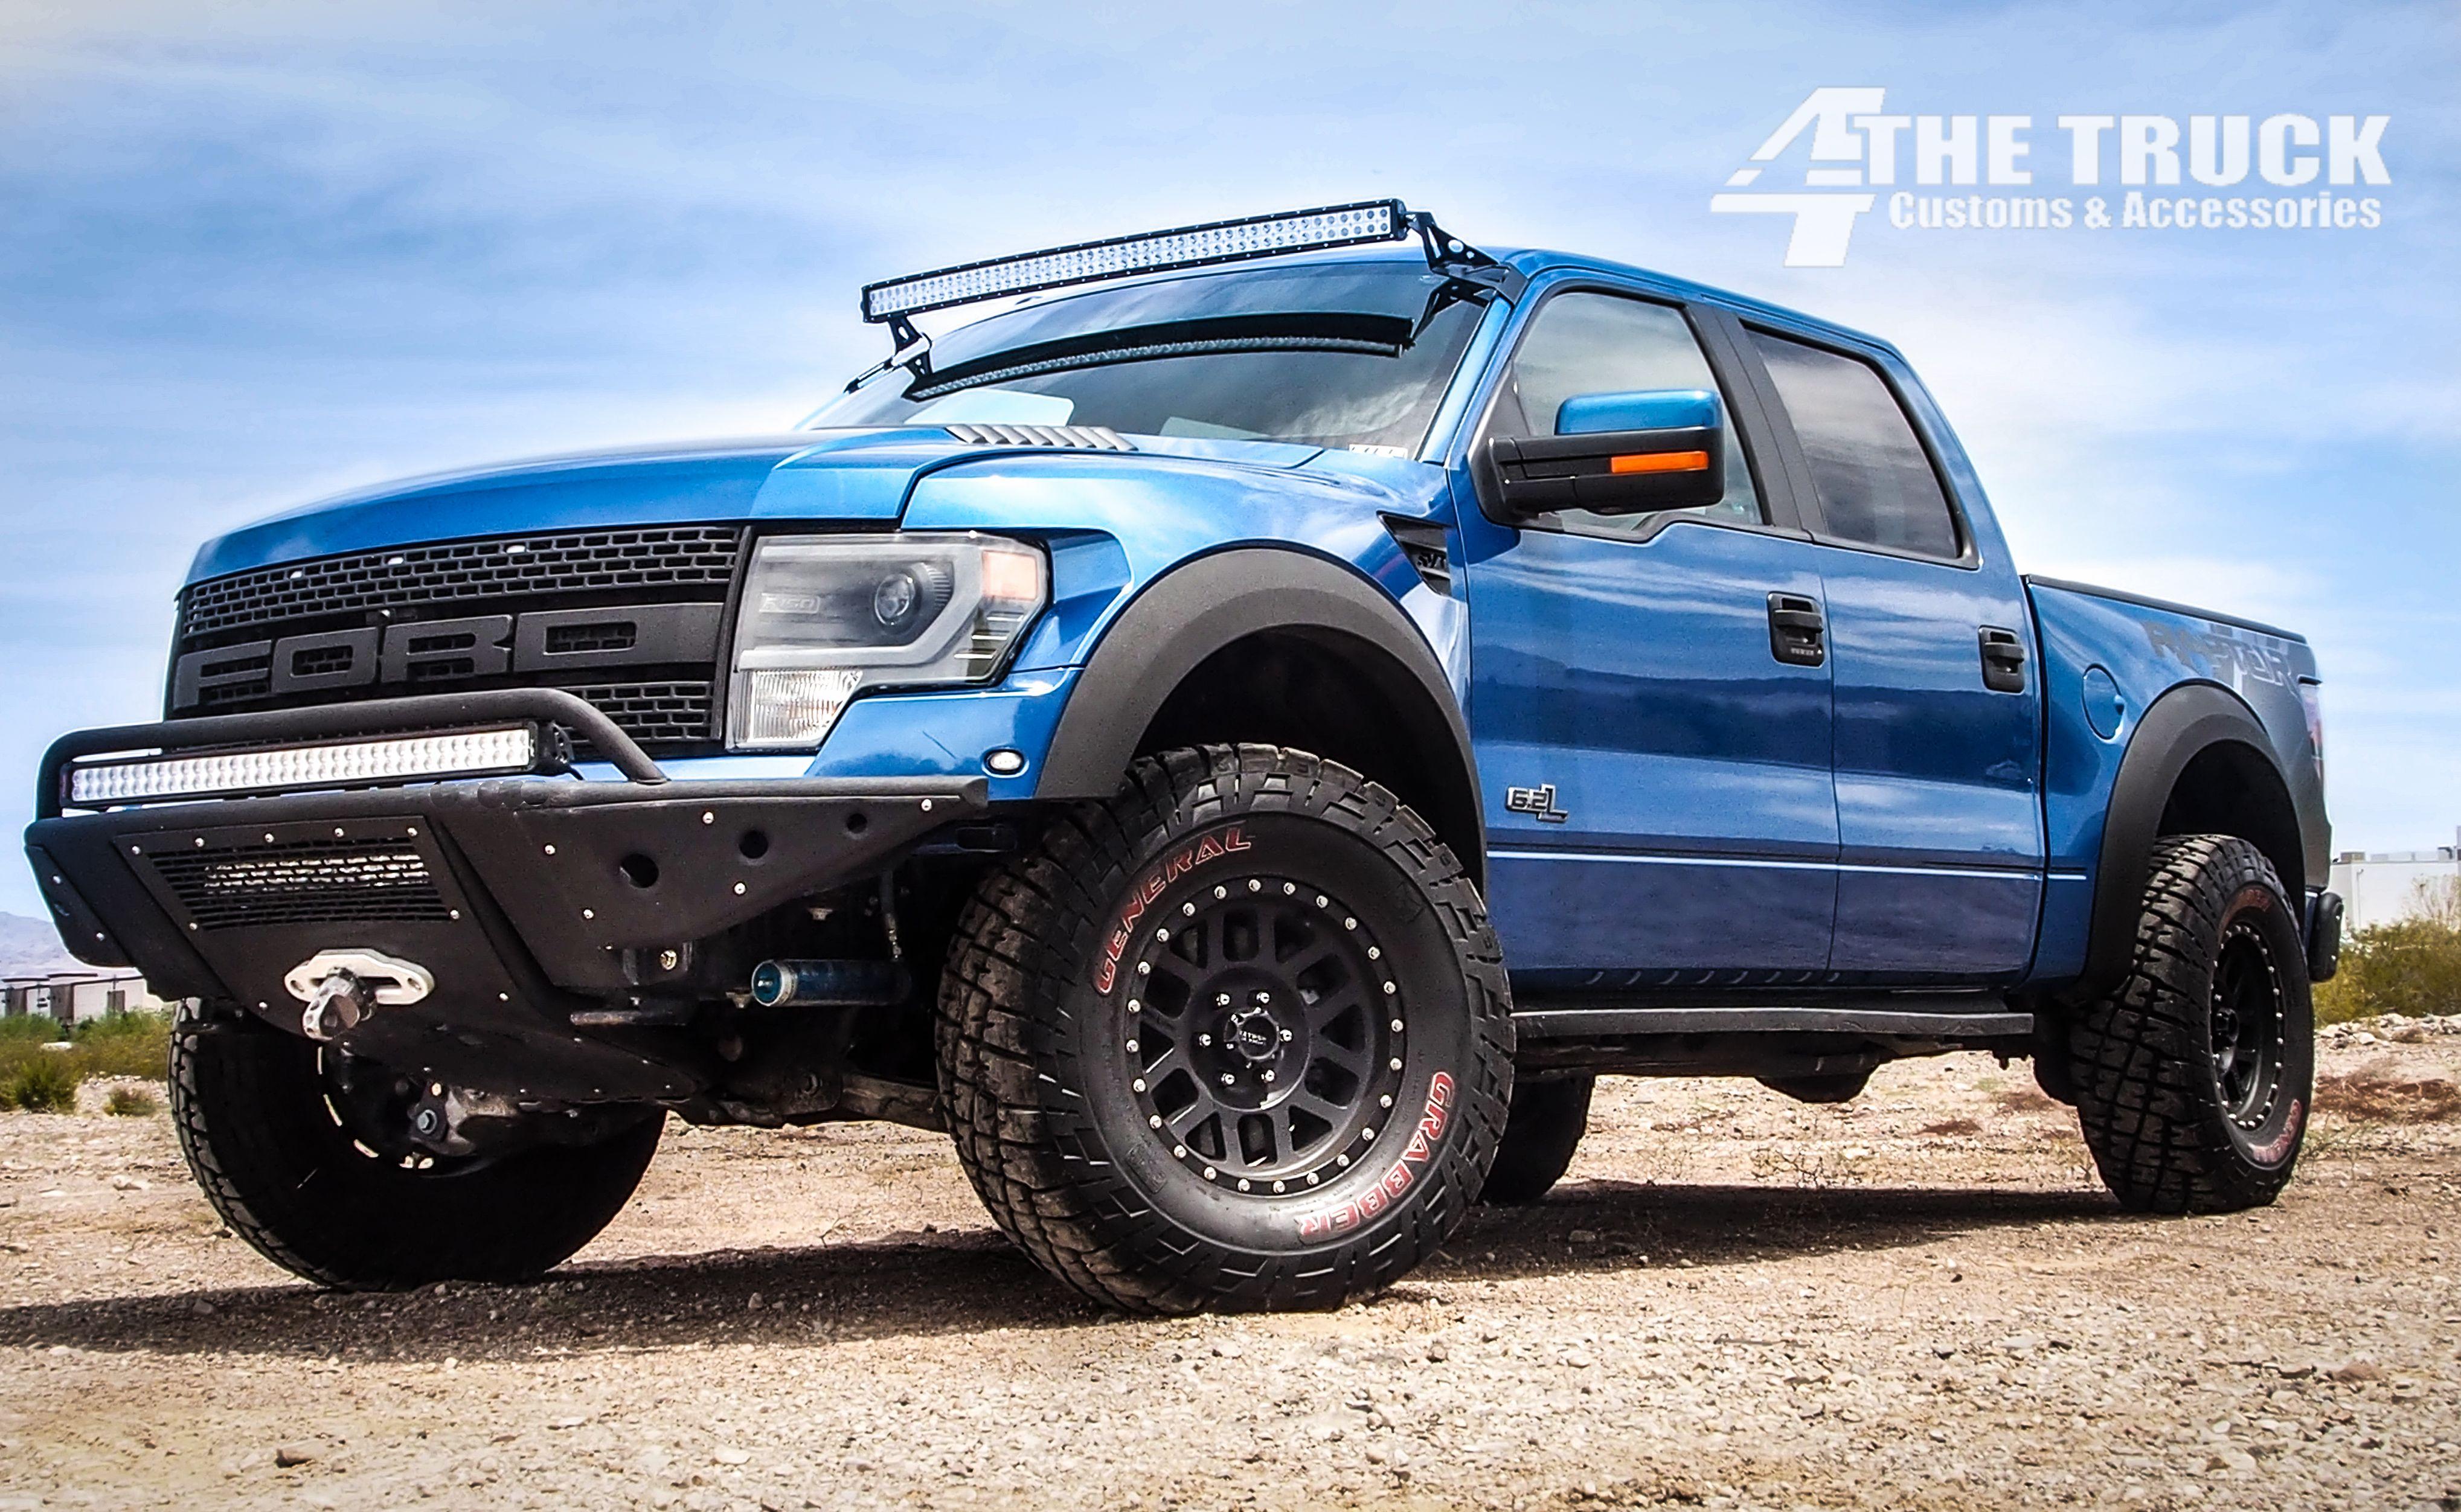 super cars crewzer love shaq motorcycles price ford